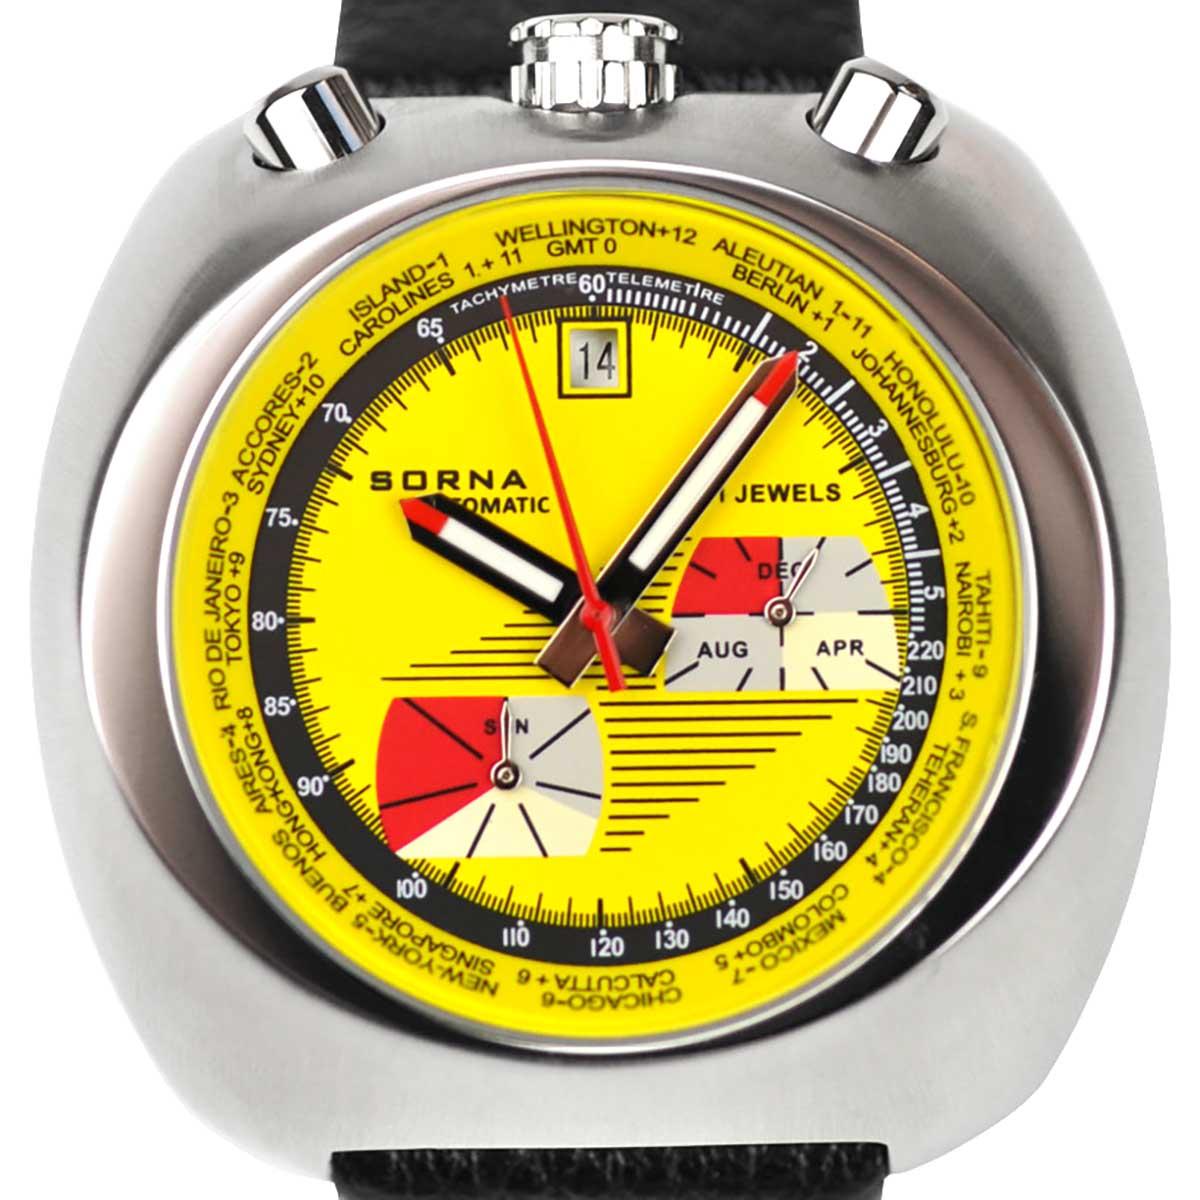 SORNA ソルナ 自動巻き(手巻き機能あり) 腕時計 [T23786-YELLOW] 並行輸入品 カレンダー